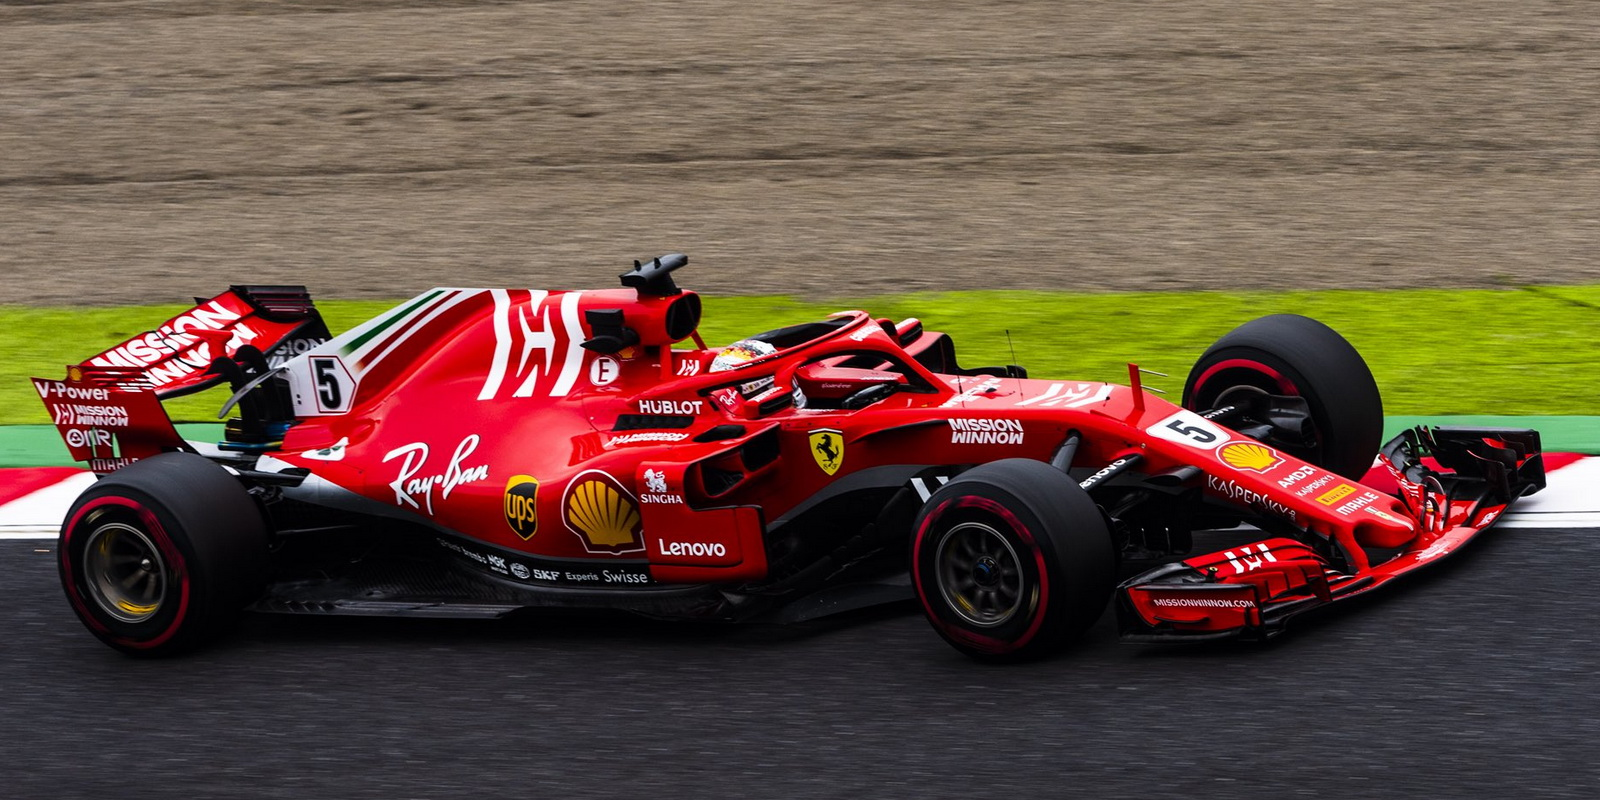 Ferrari Updates Formula 1 Livery For Rest Of 2018 Season